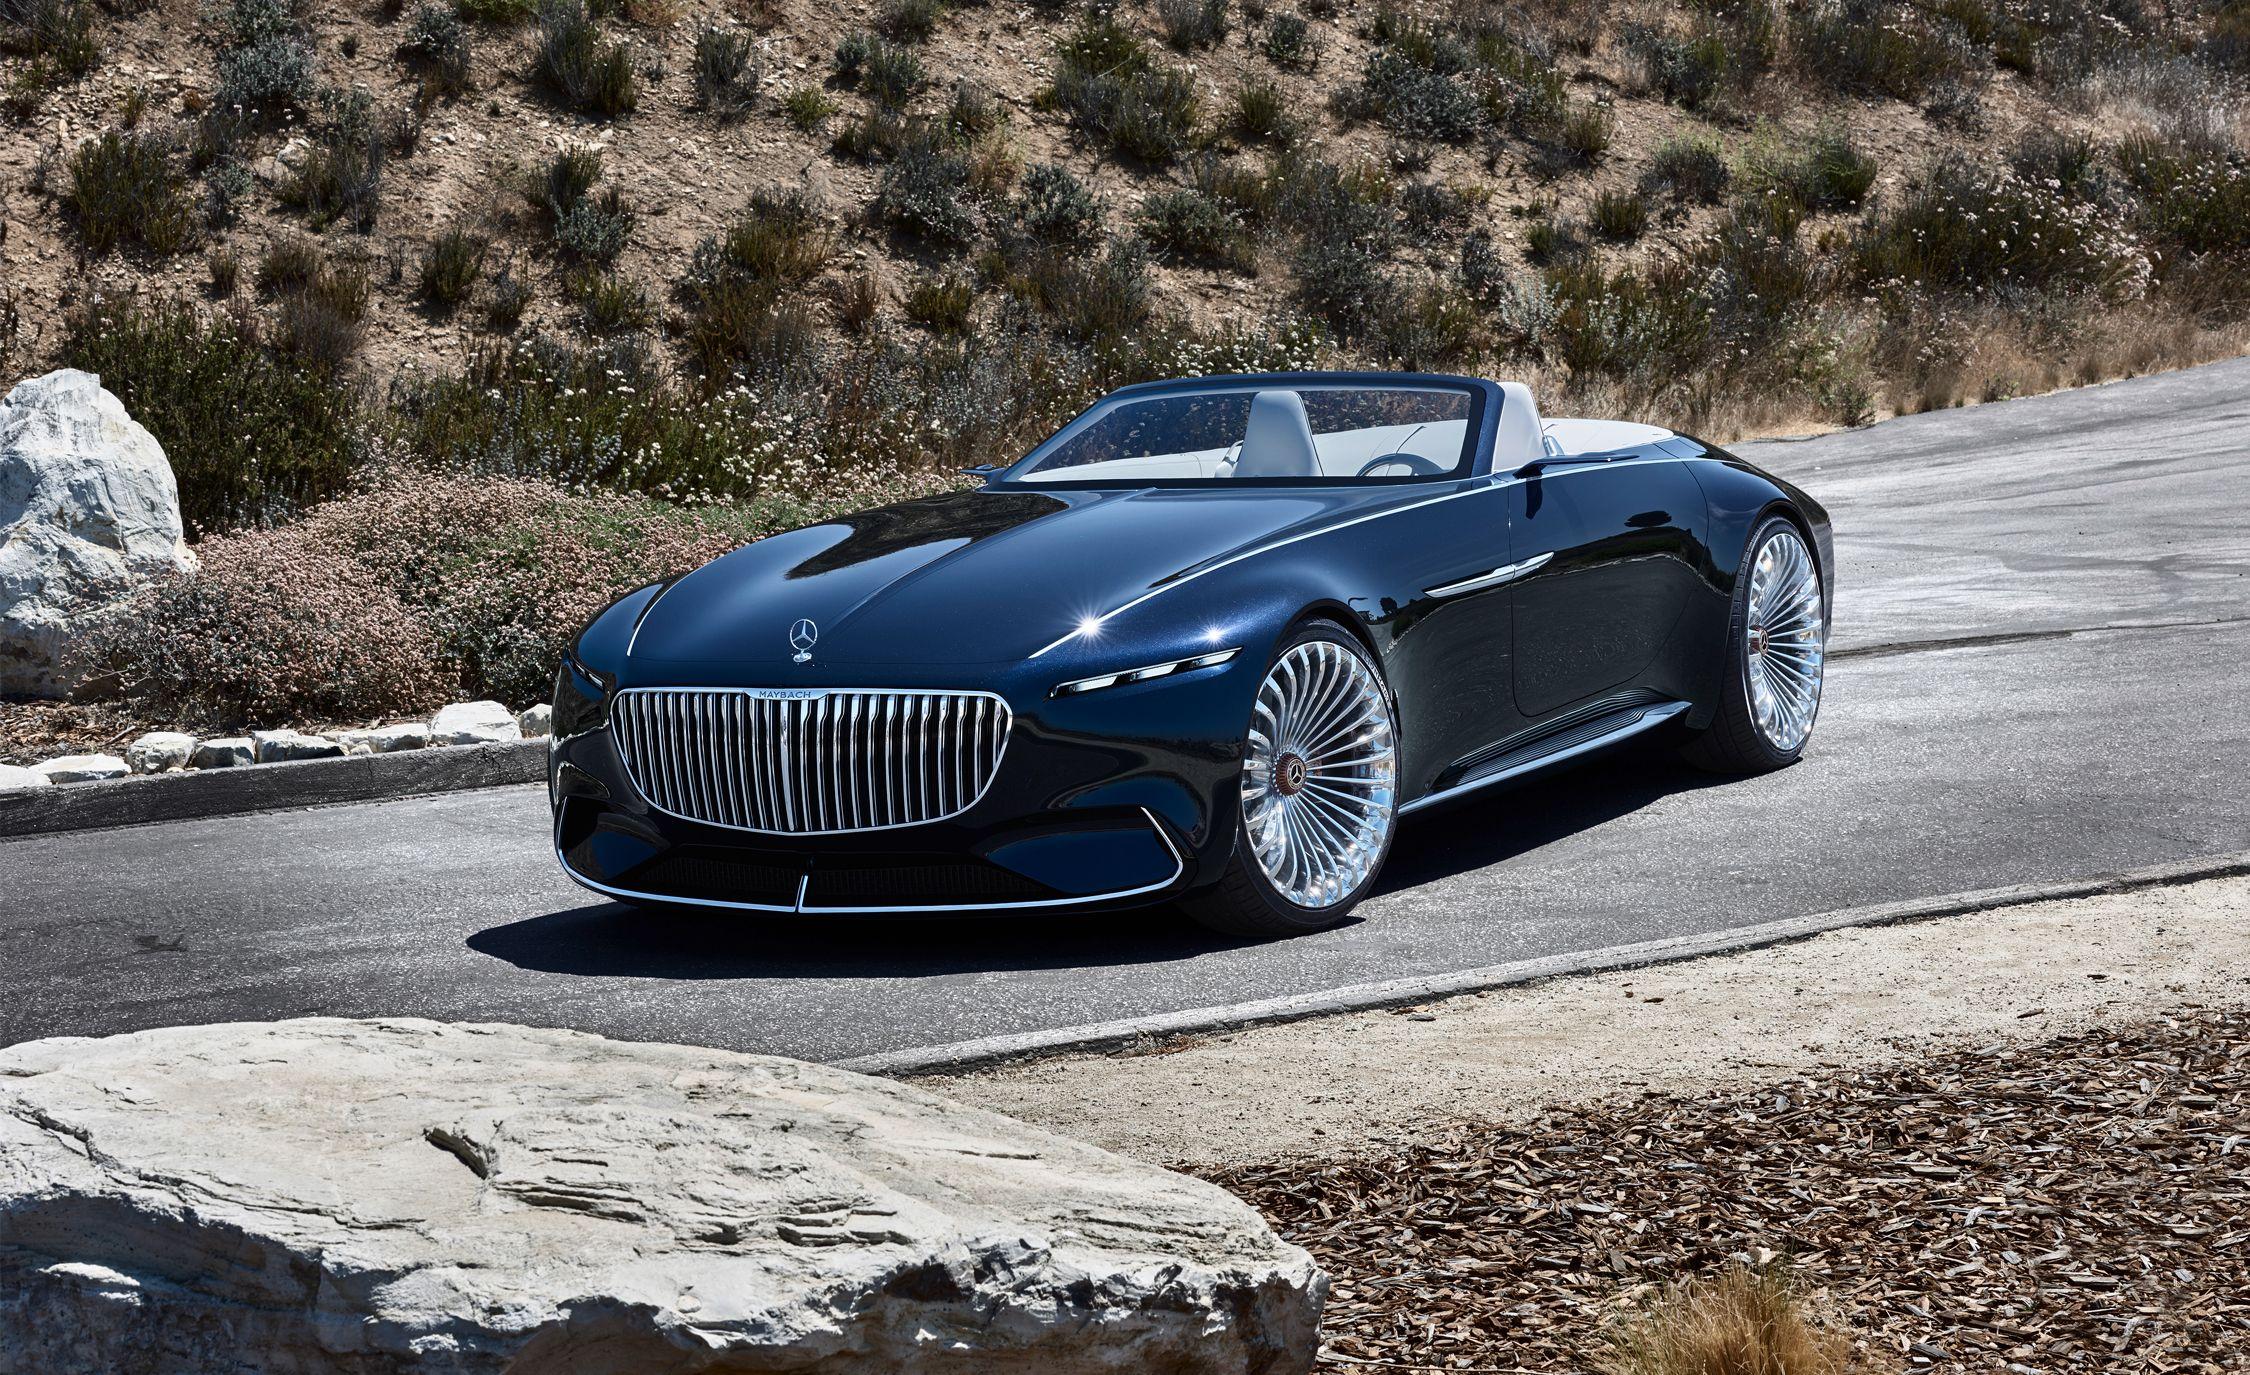 Vision Mercedesmaybach 6 Cabriolet Photos And Info News